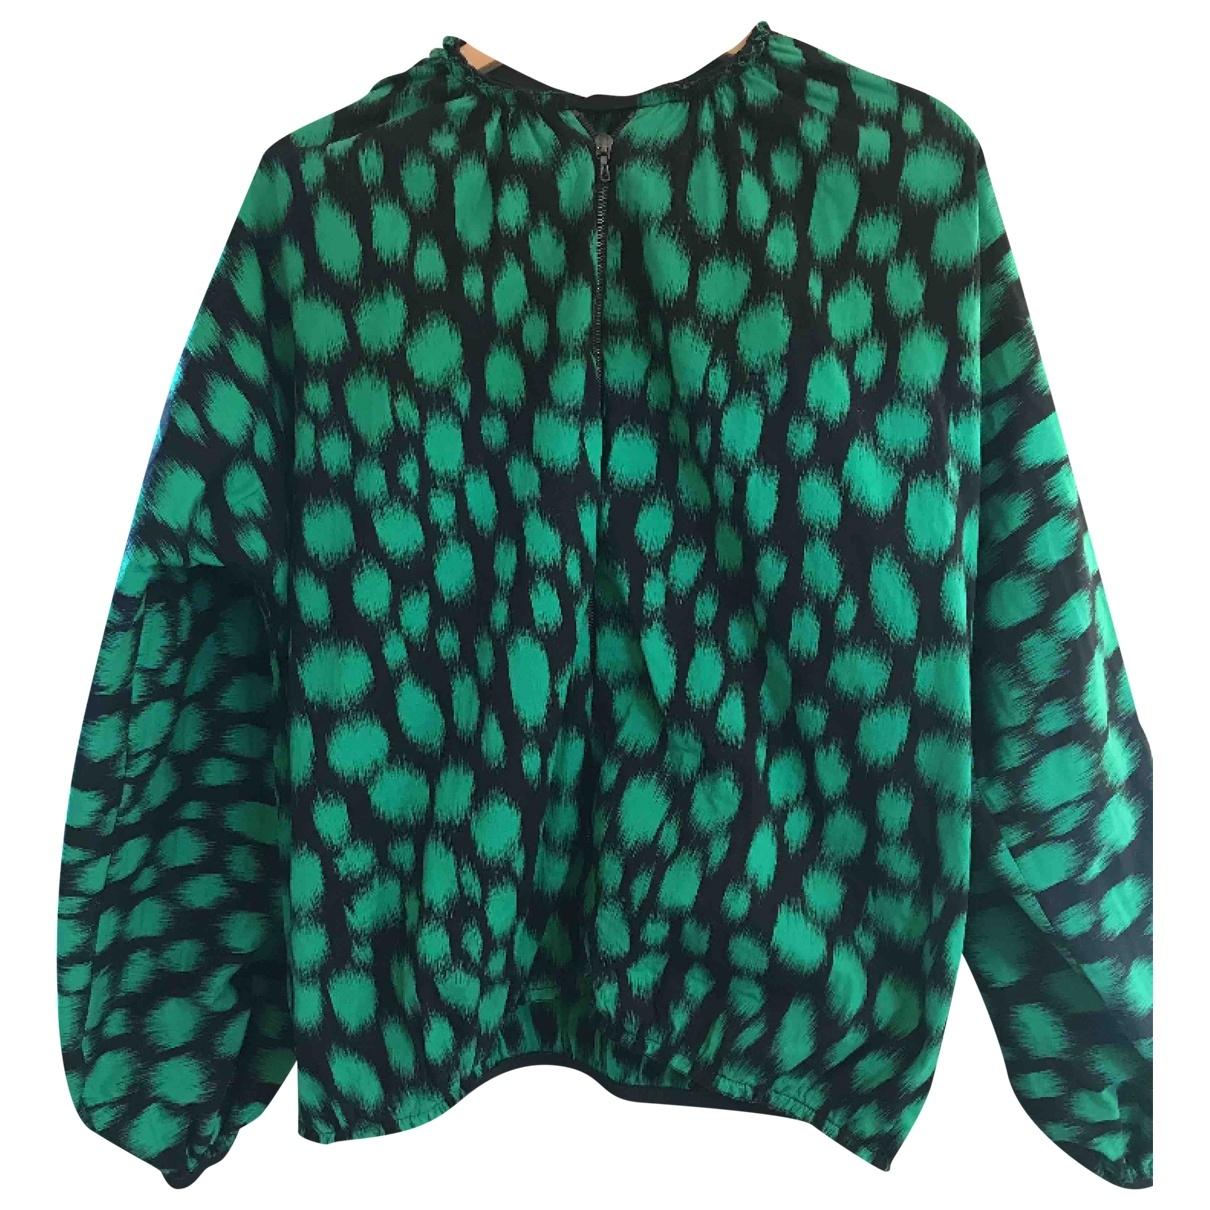 Lanvin \N Green Cotton jacket for Women 42 FR